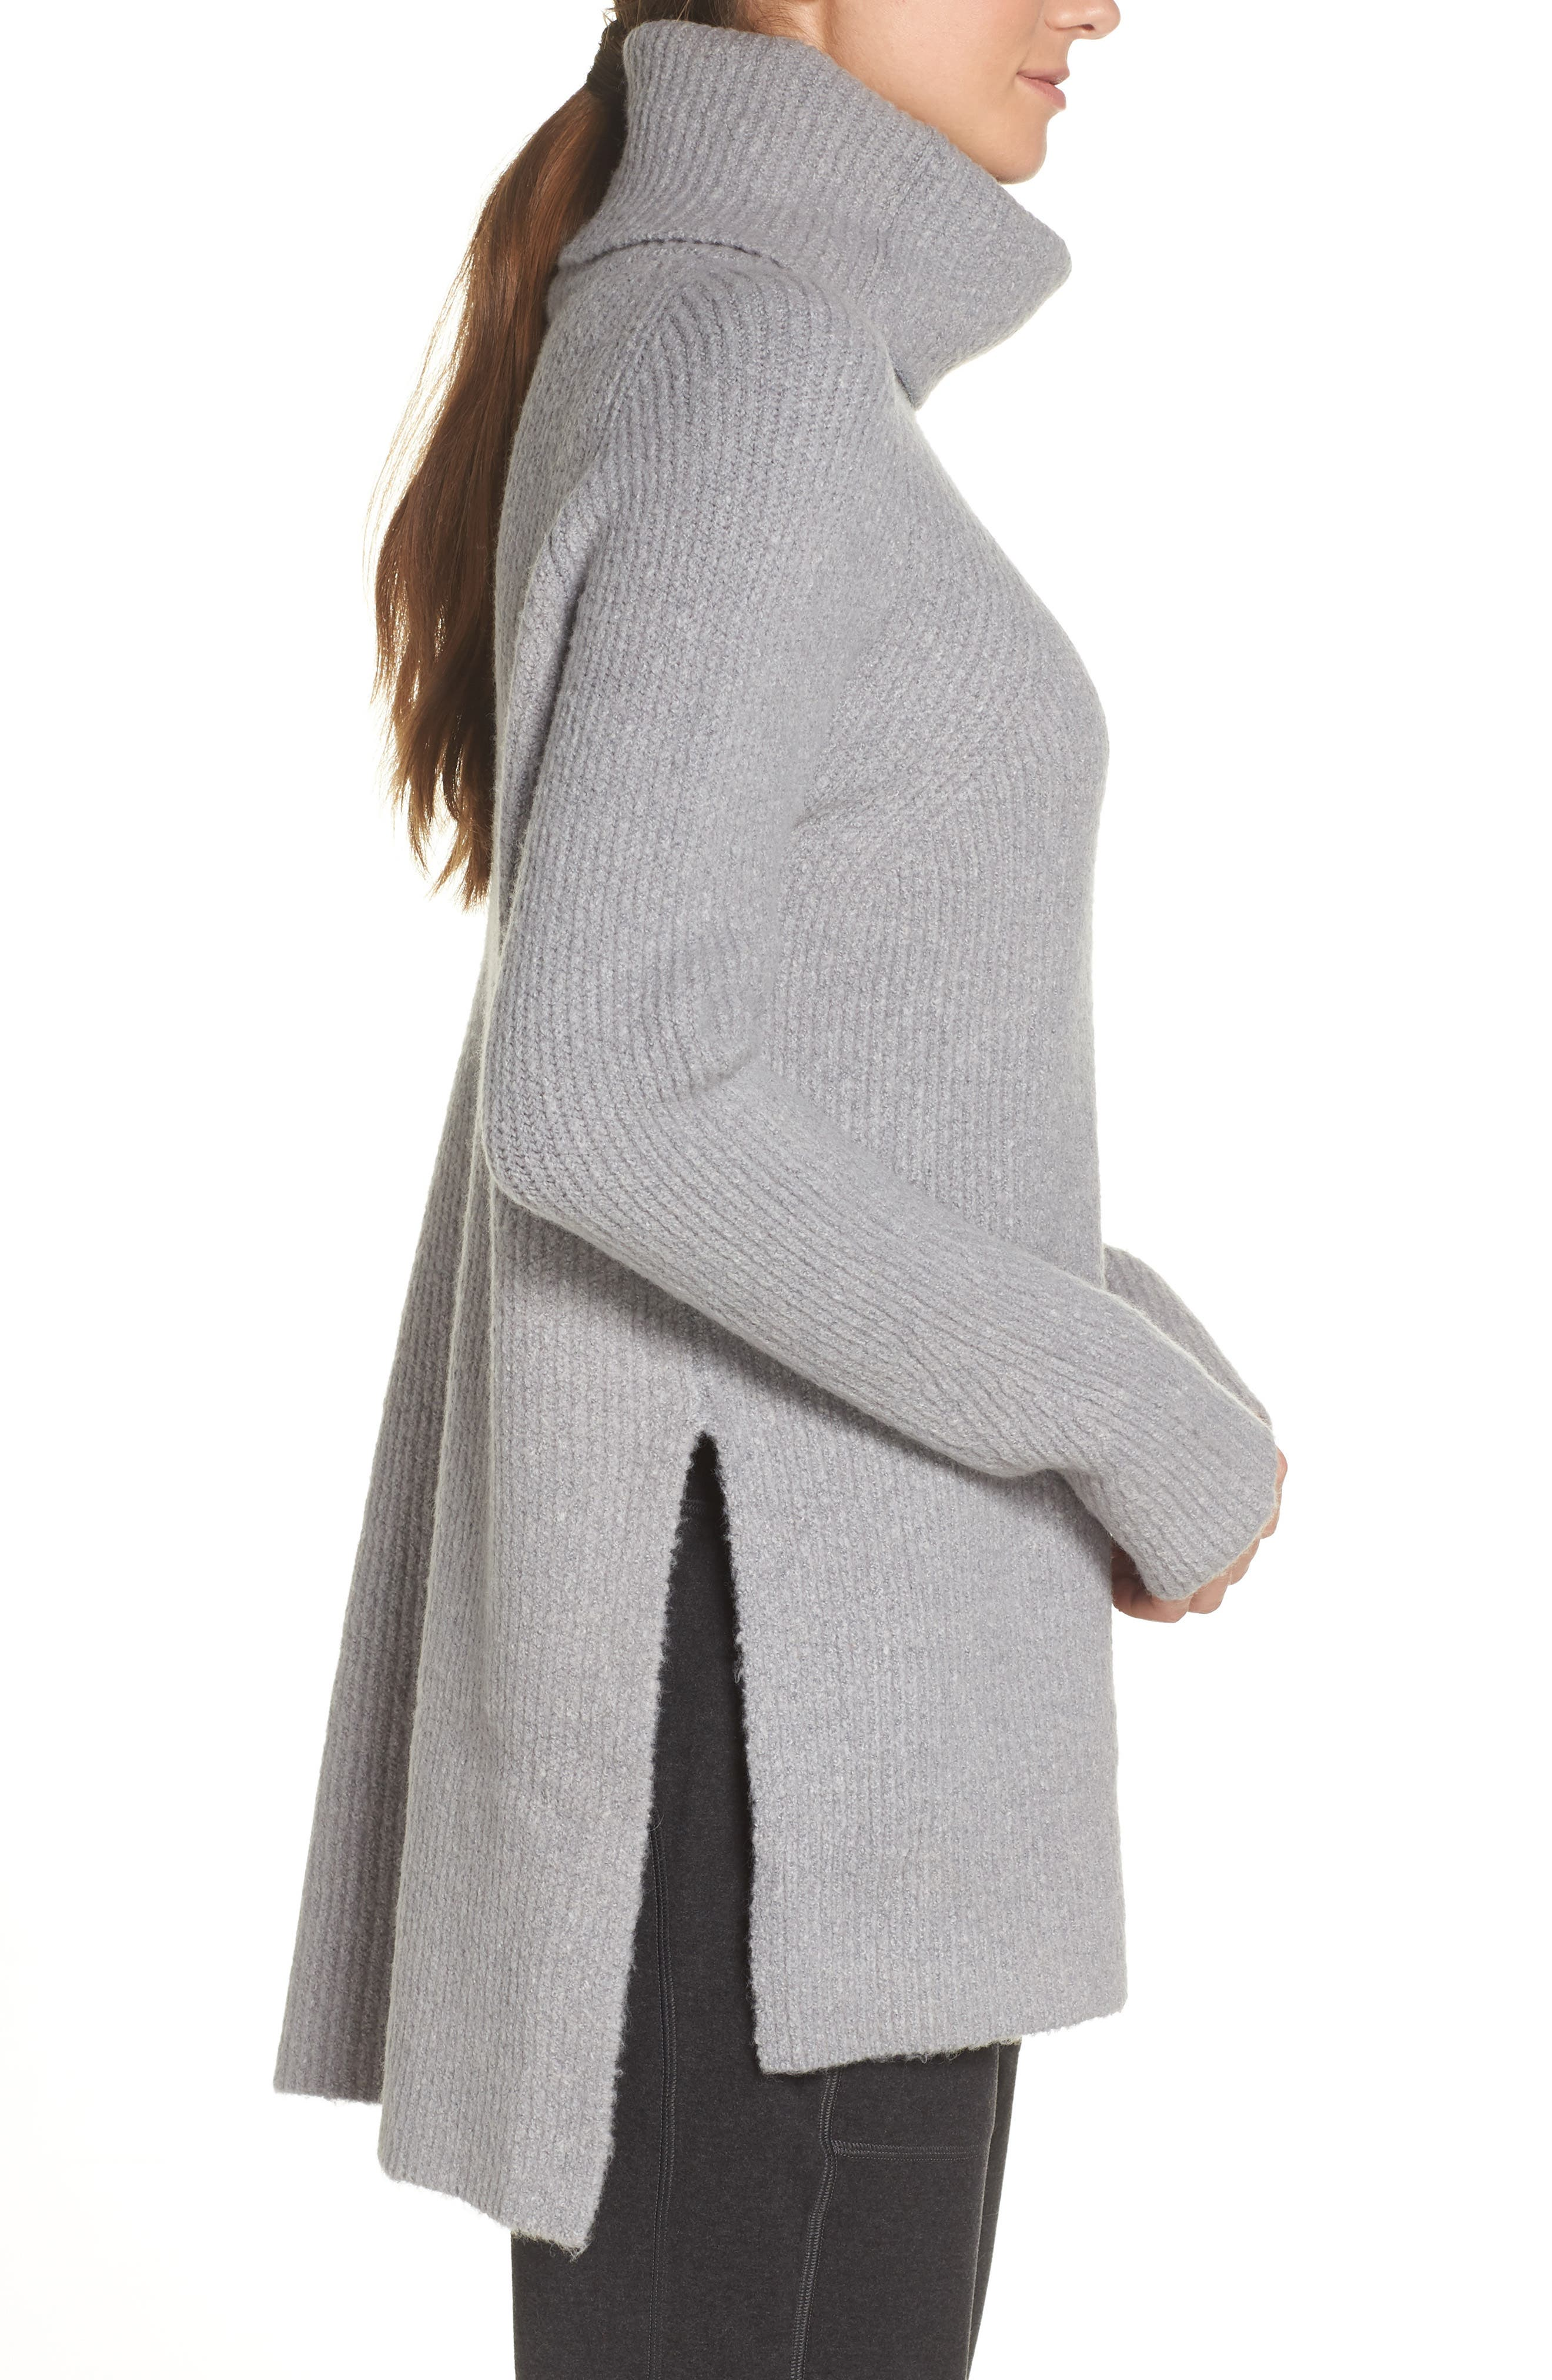 SWEATY BETTY,                             Shakti Oversize Sweater,                             Alternate thumbnail 3, color,                             023